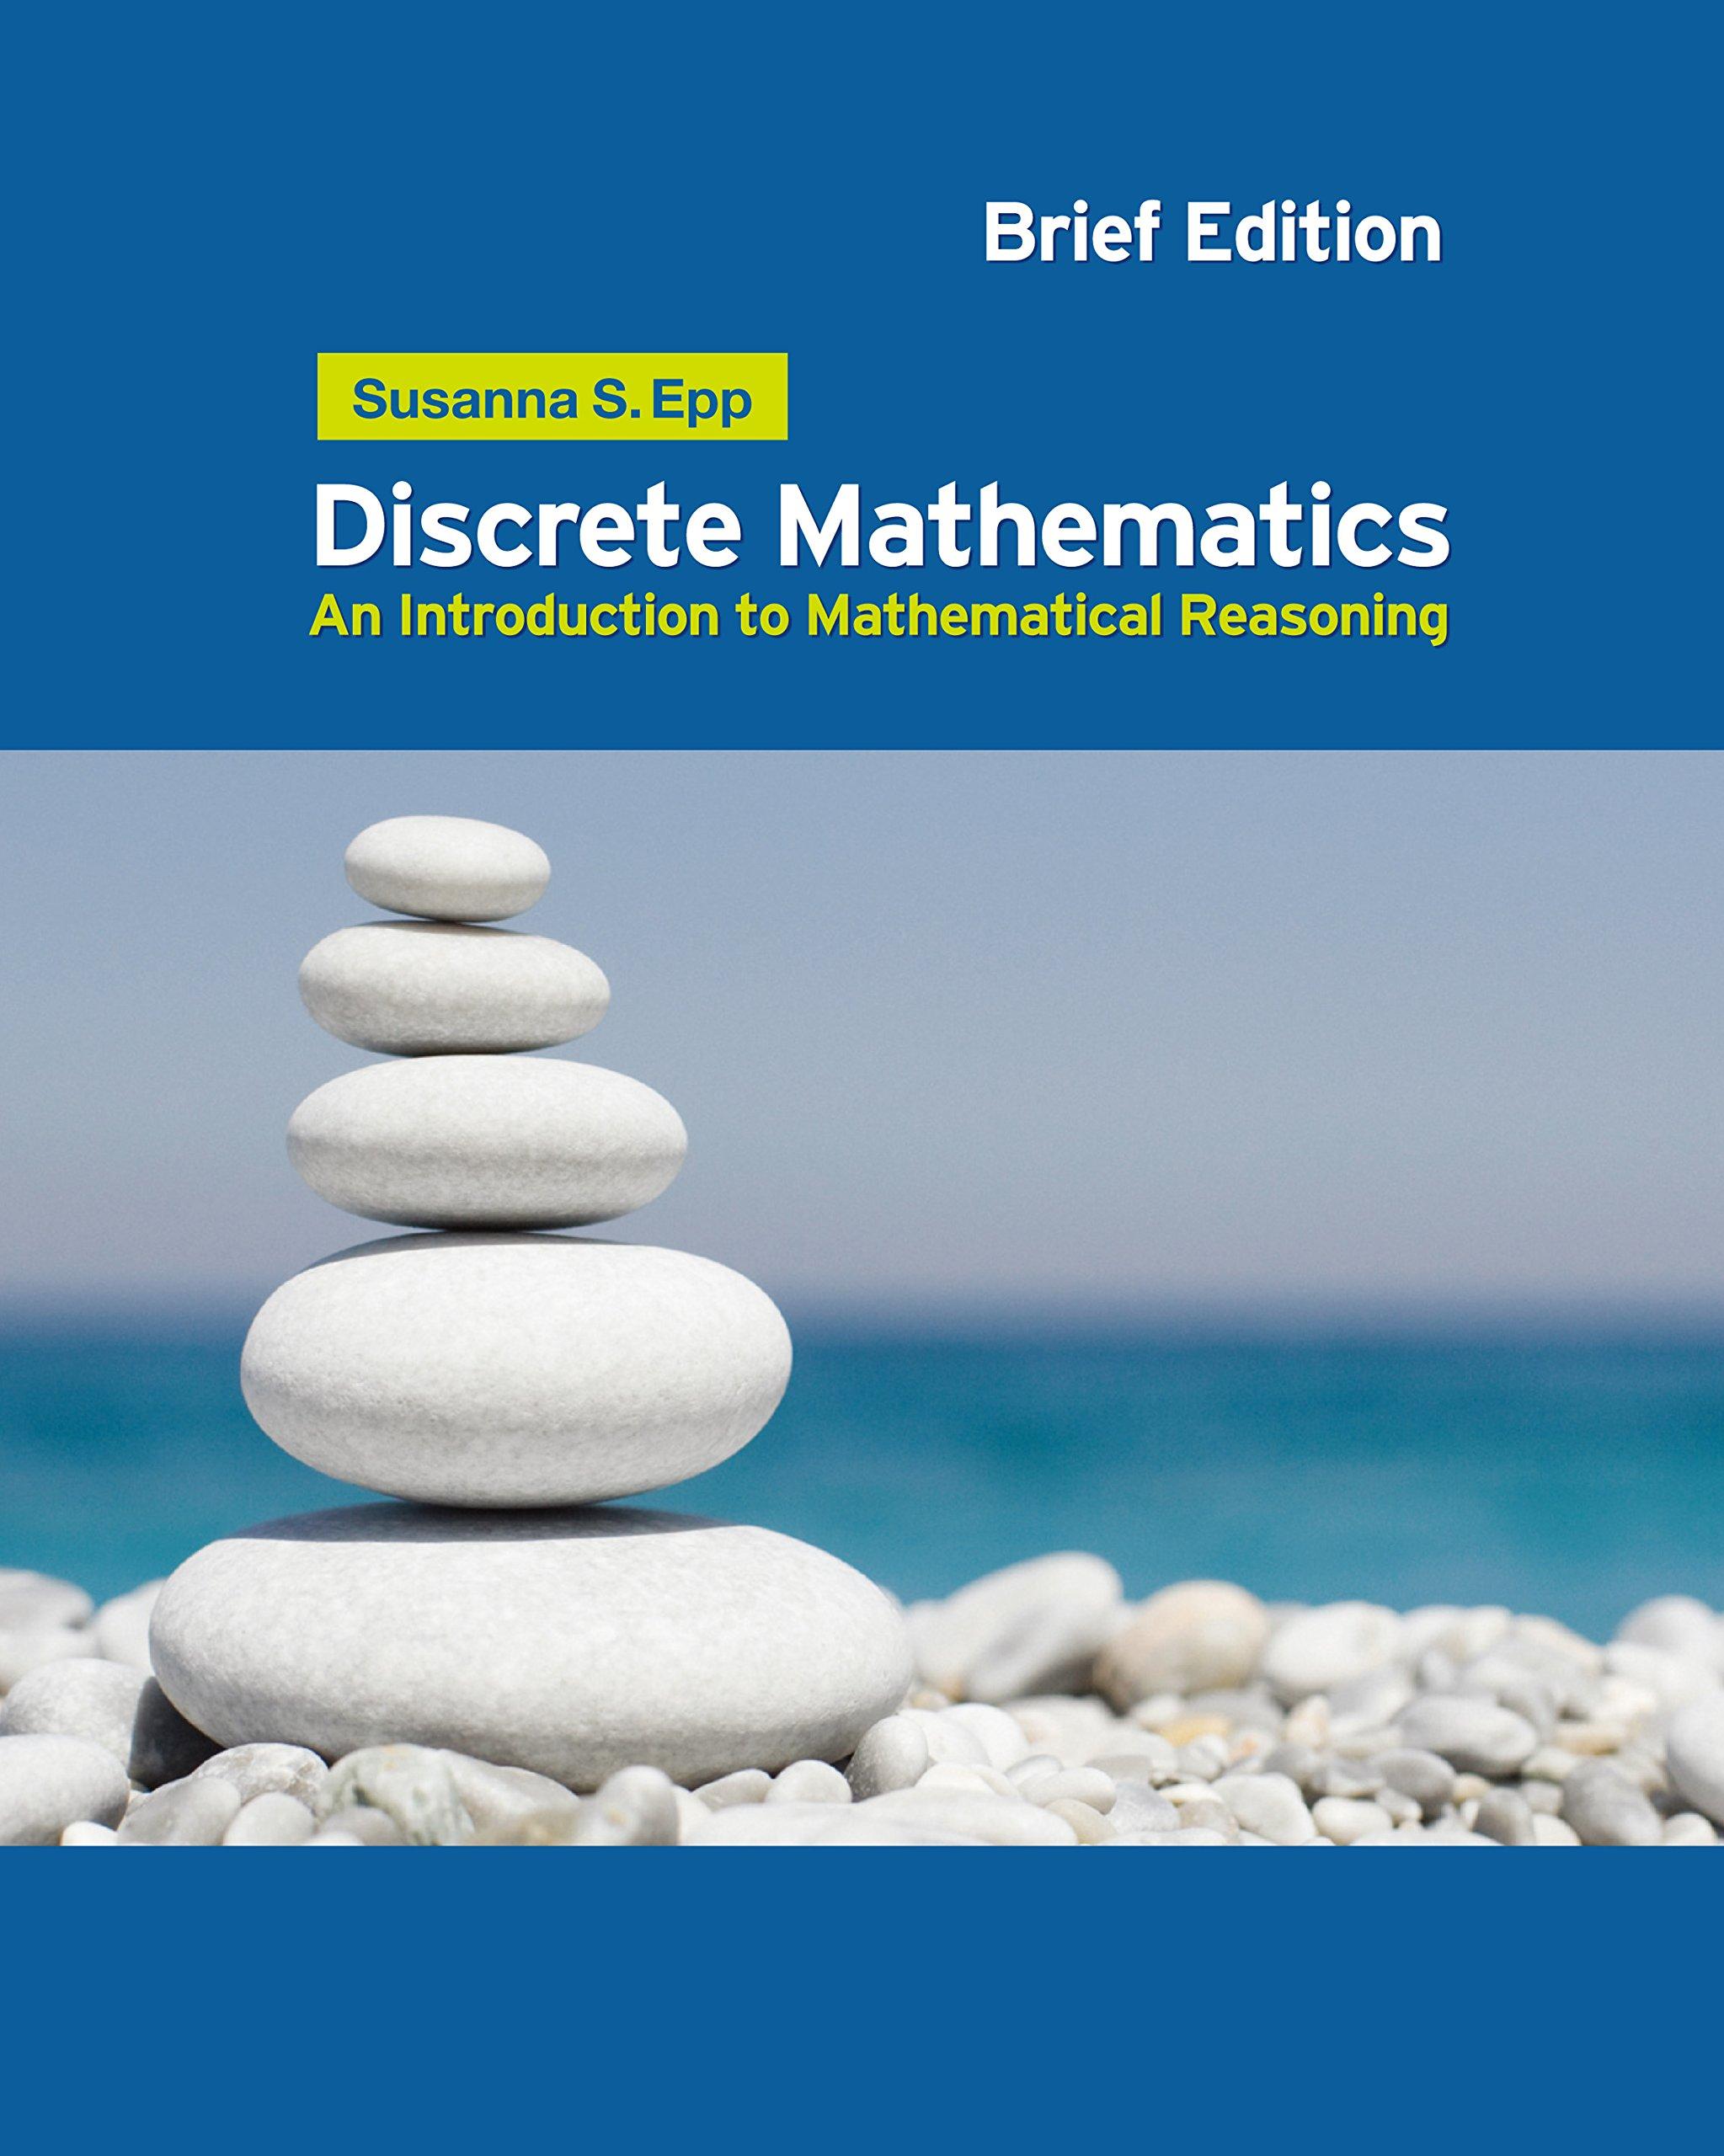 Discrete Mathematics With Applications 4th Edition Pdf